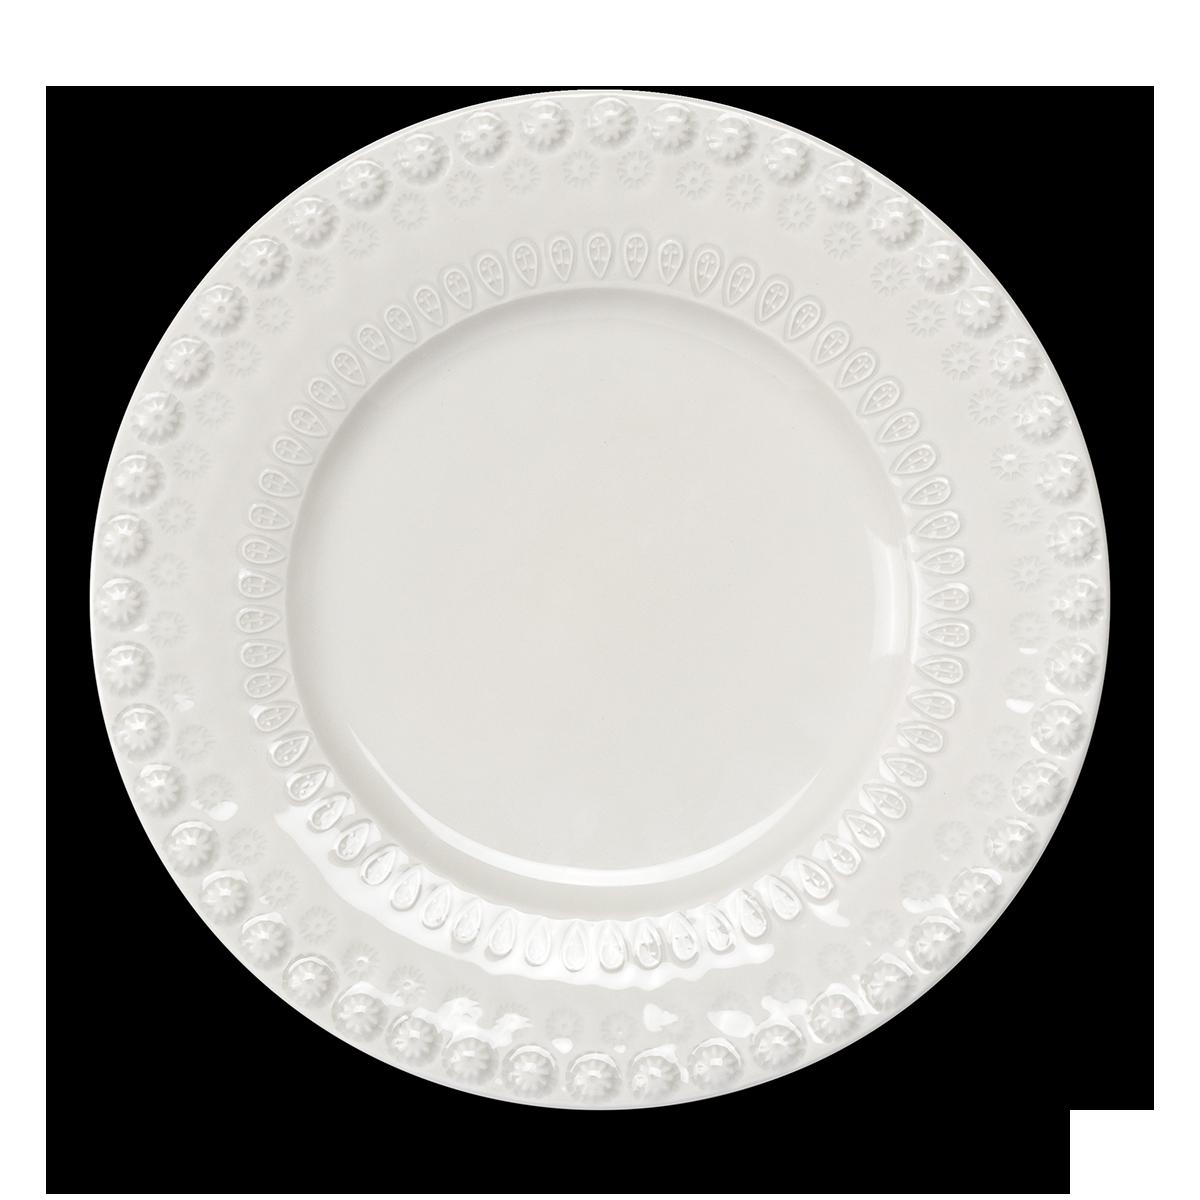 Beaded Plate